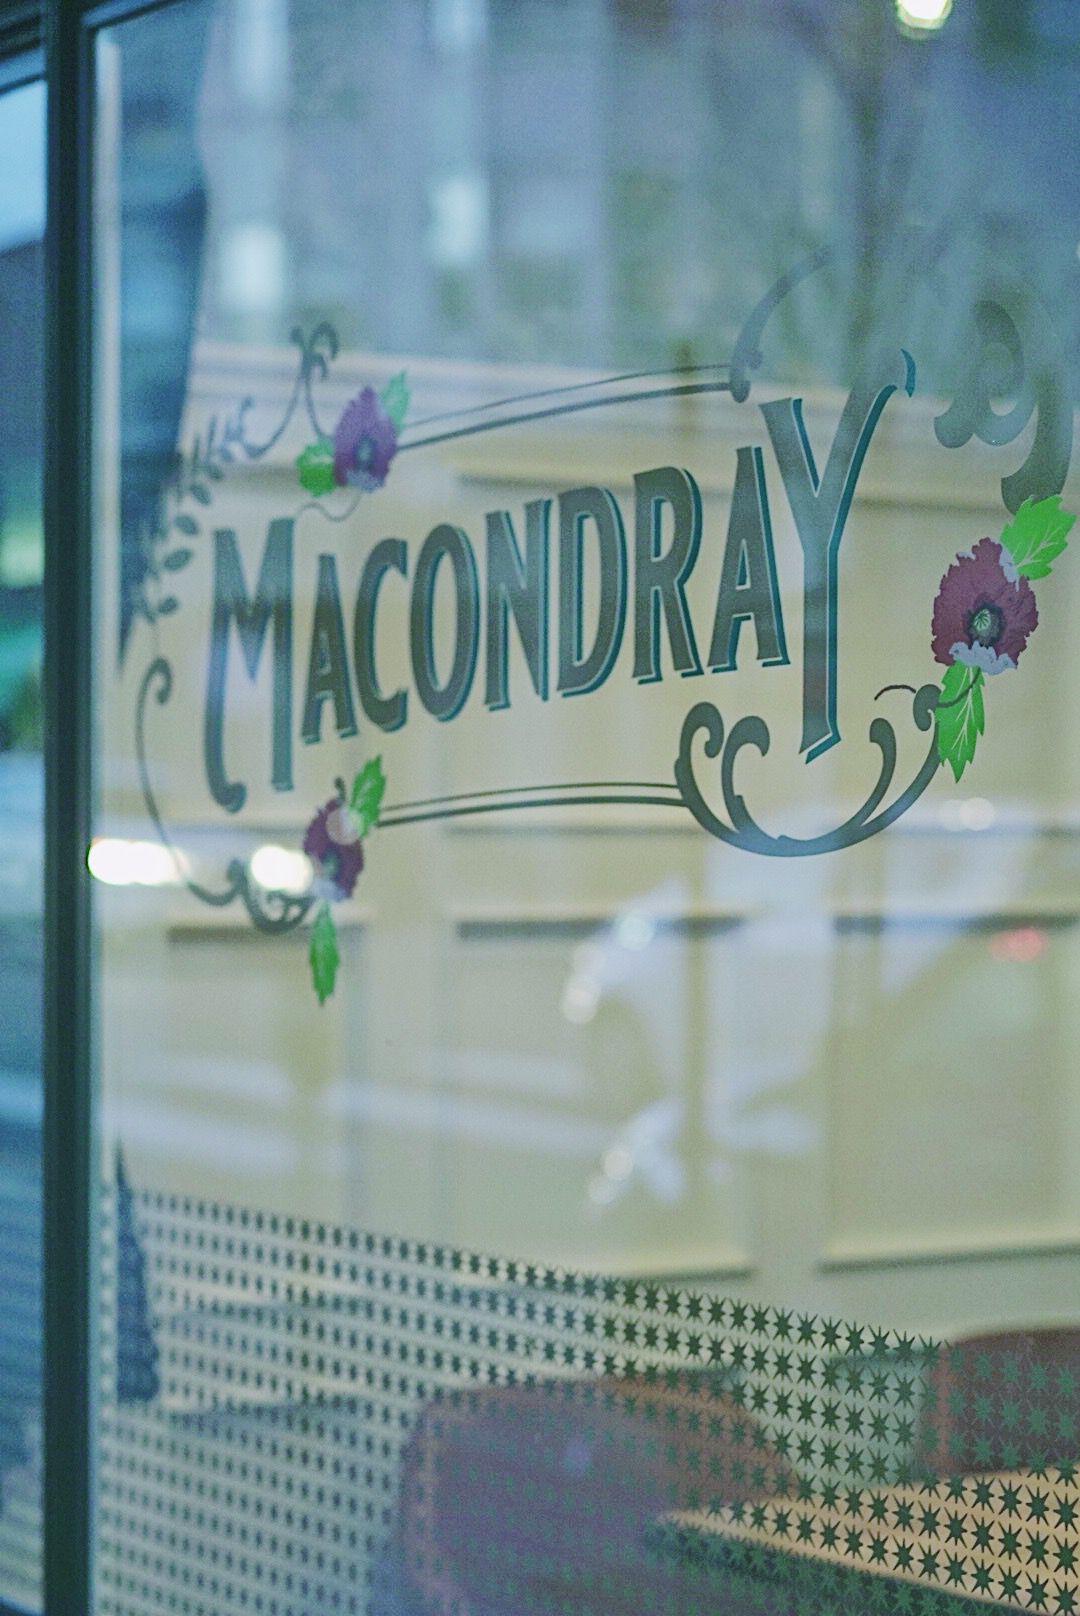 Window sign at Macondray